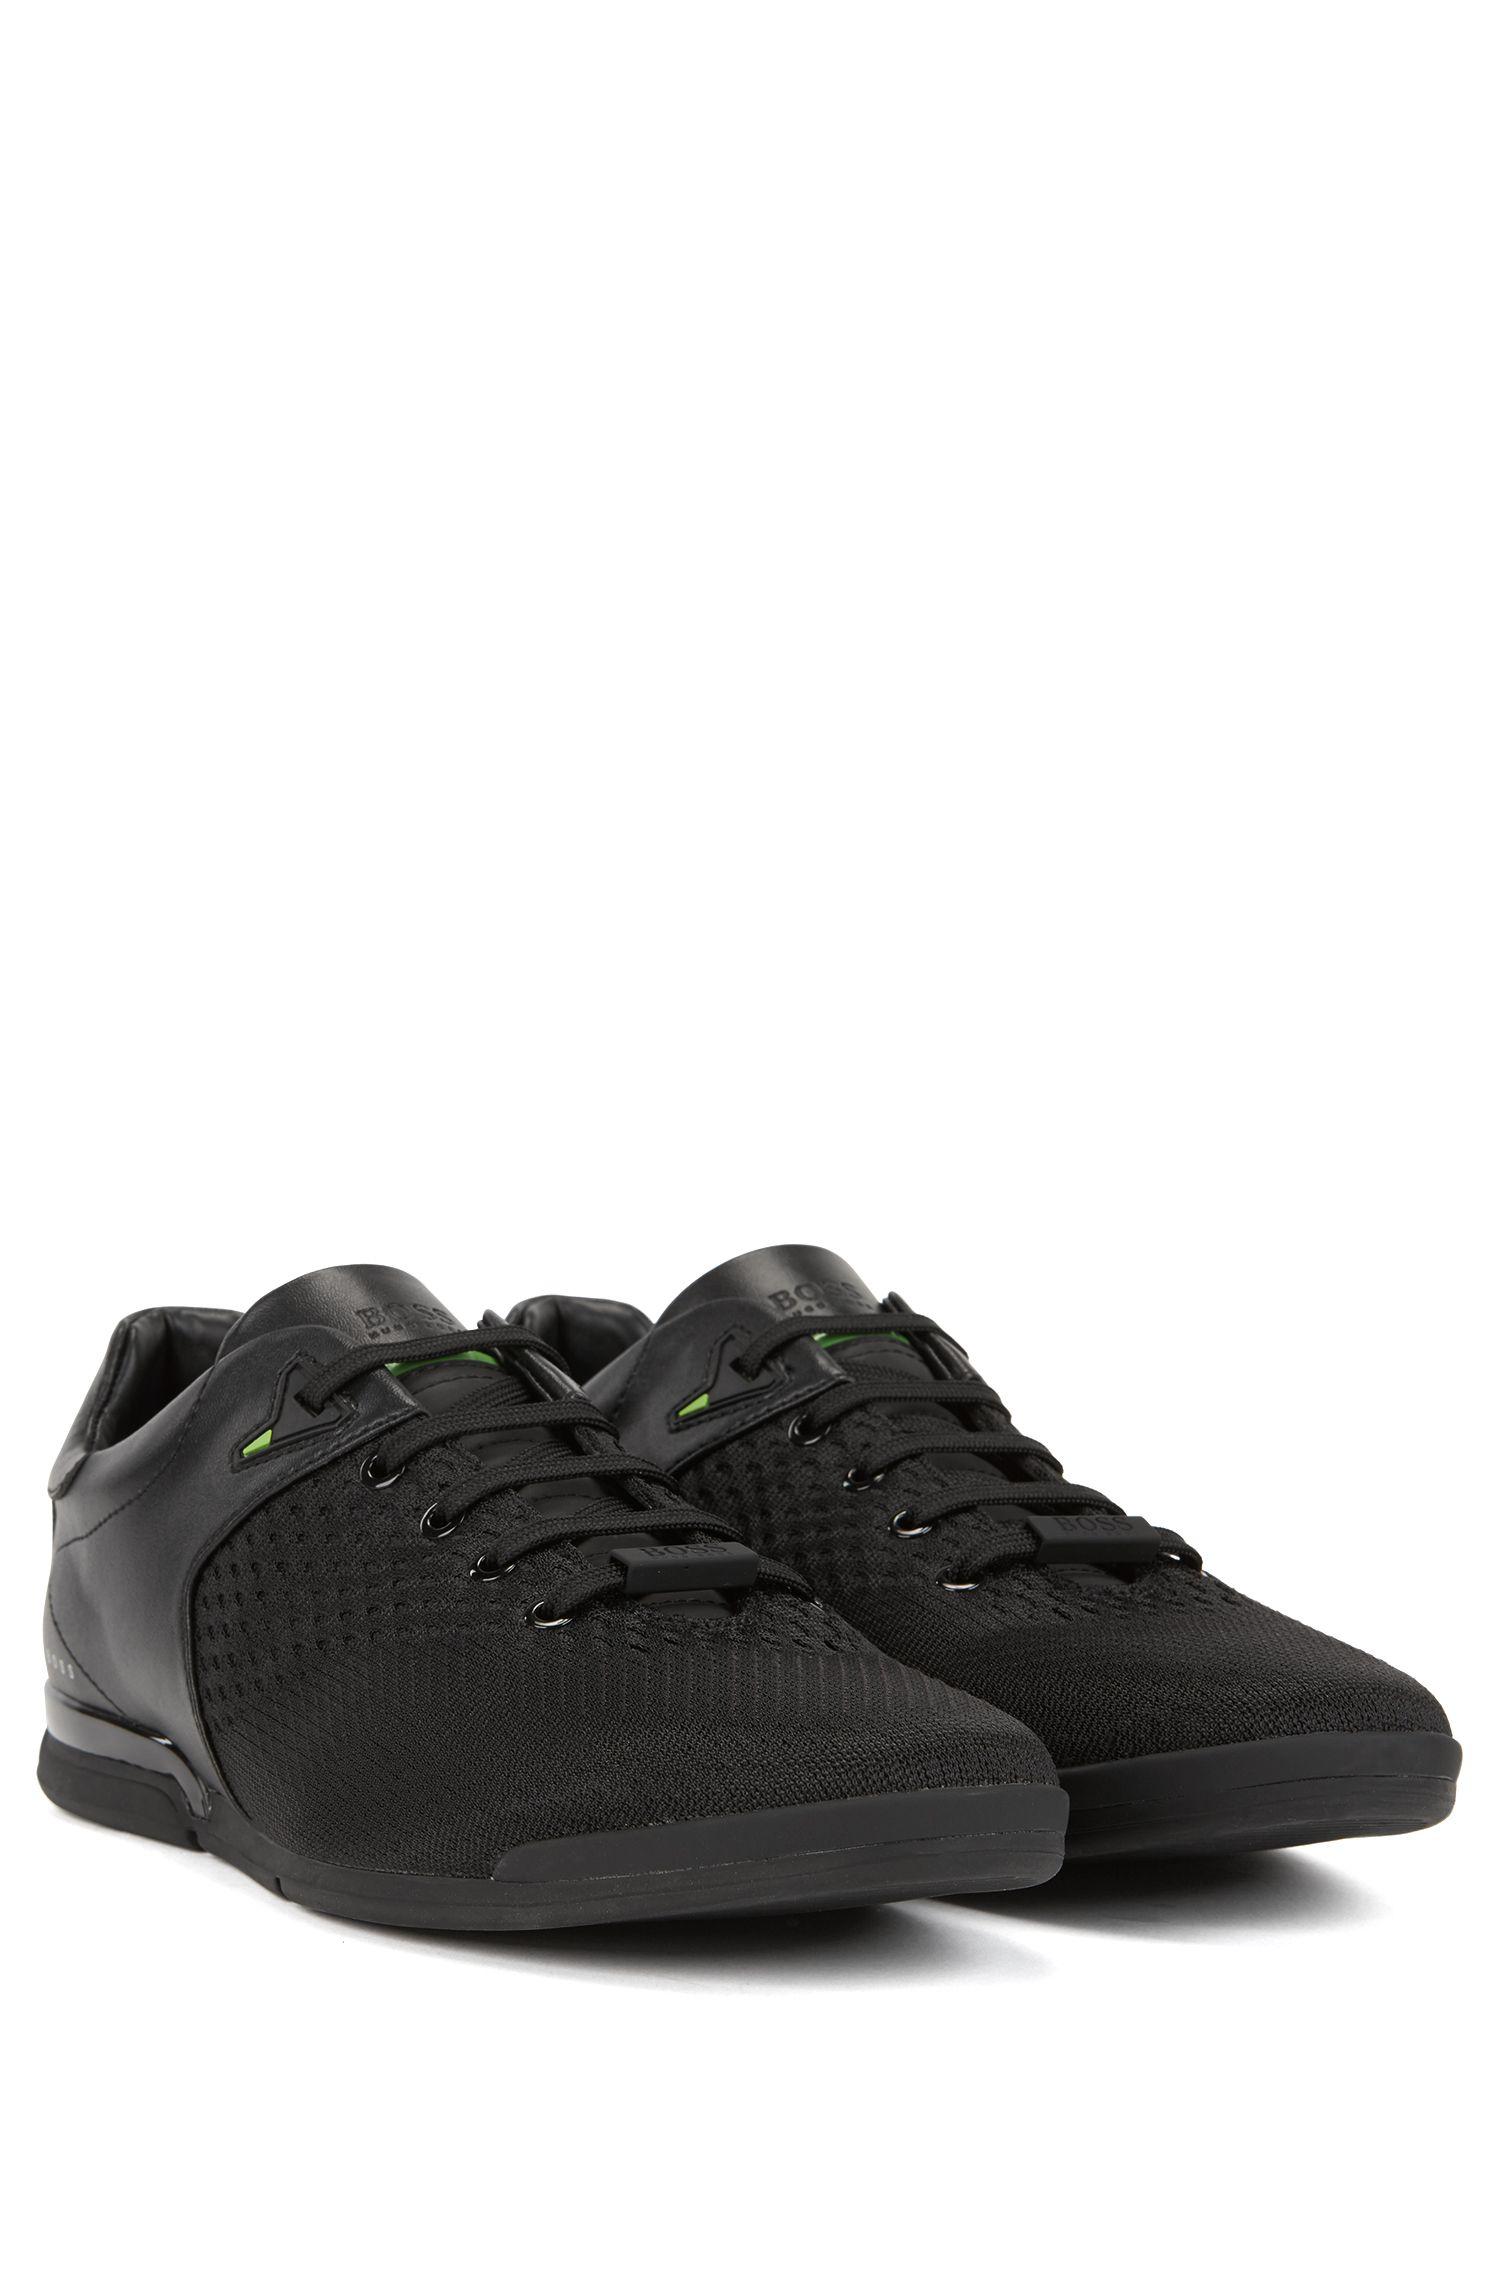 Lowtop Sneakers aus Jacquard-Strick, Schwarz